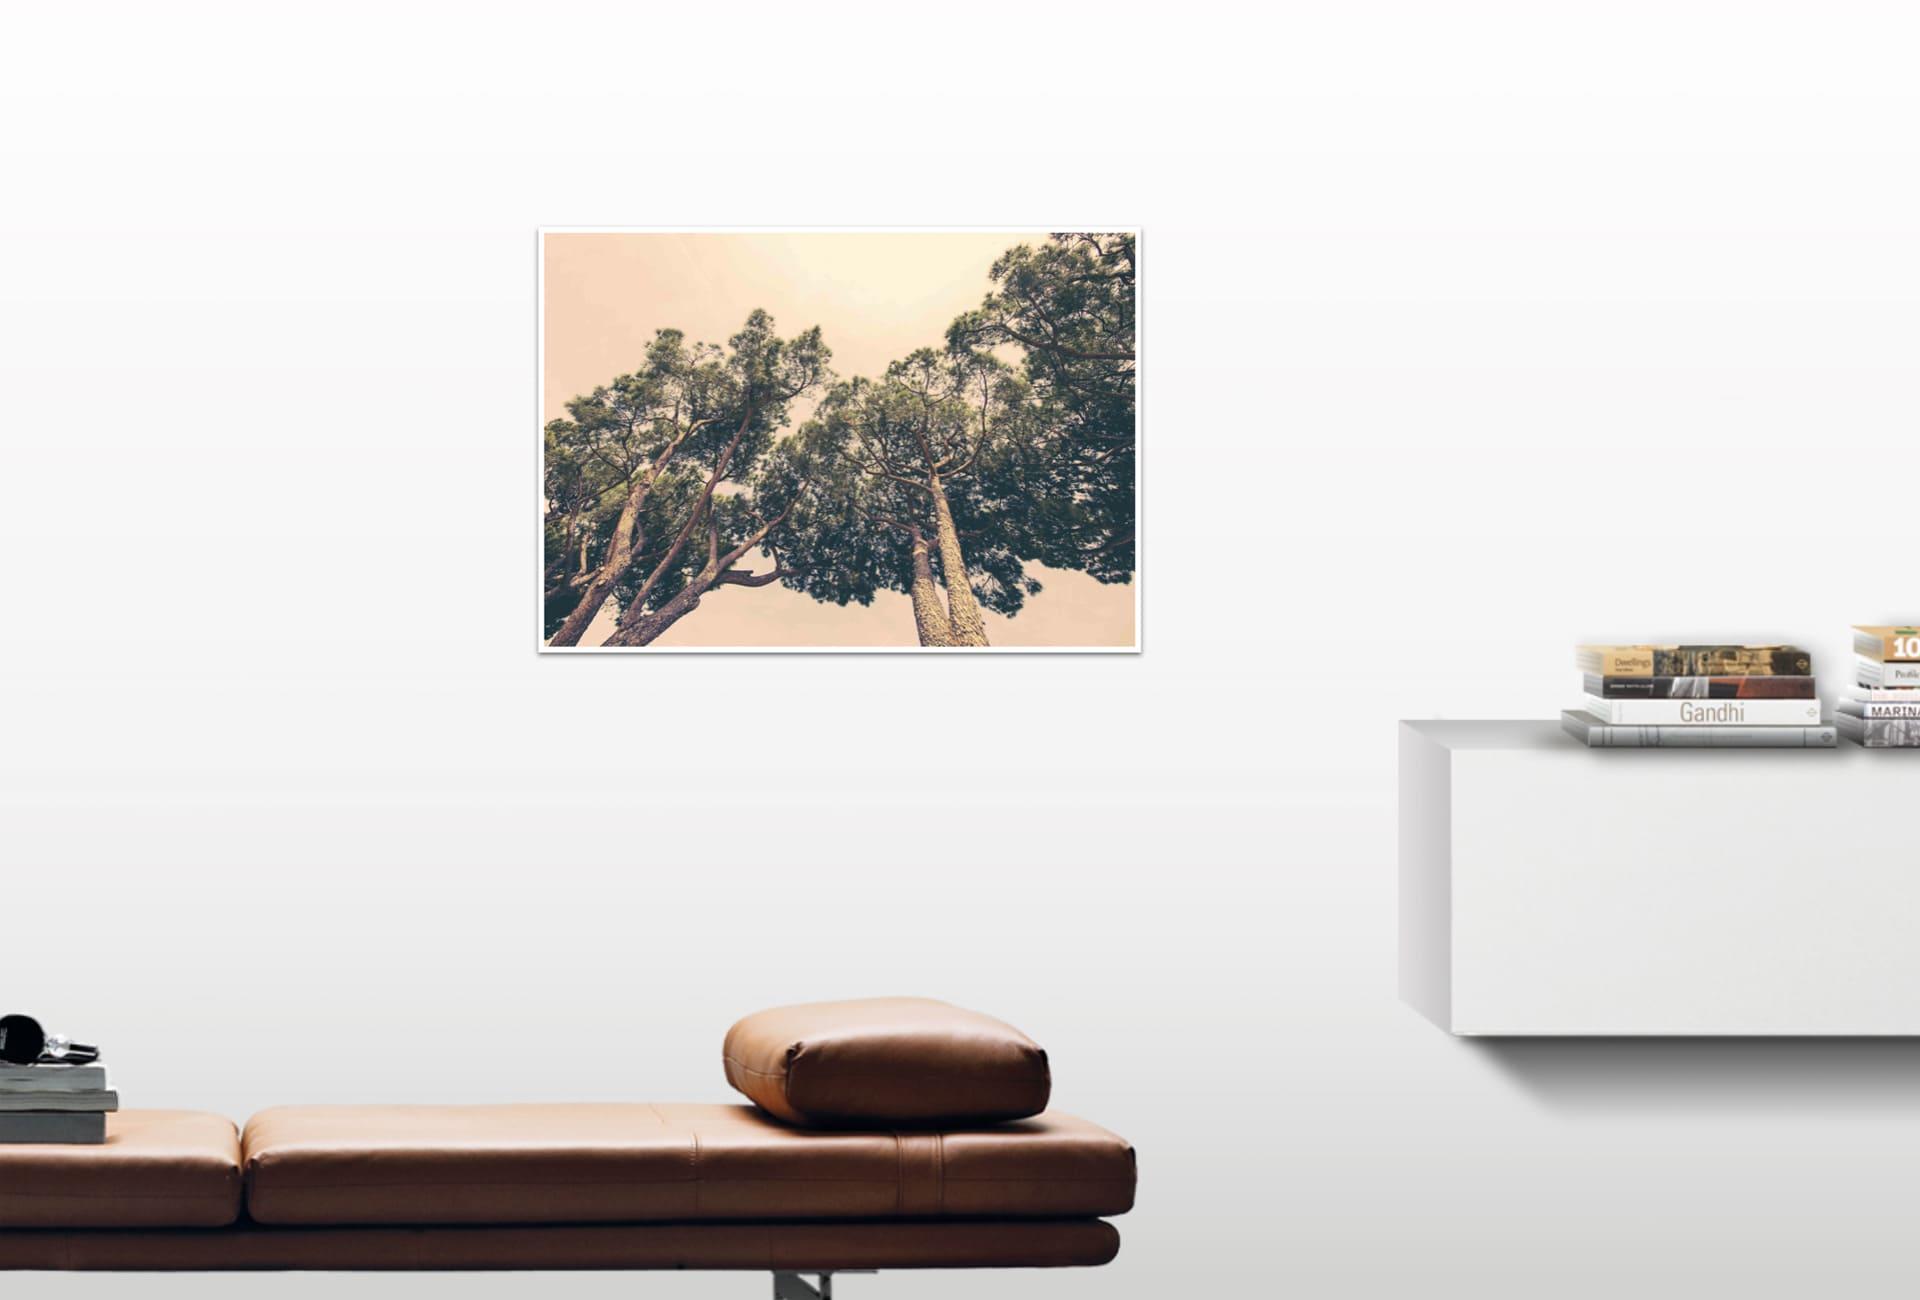 simoarts-com-simone-kessler-fotokunst-nuernberg-gardasee-autumn-motiv4-milieu